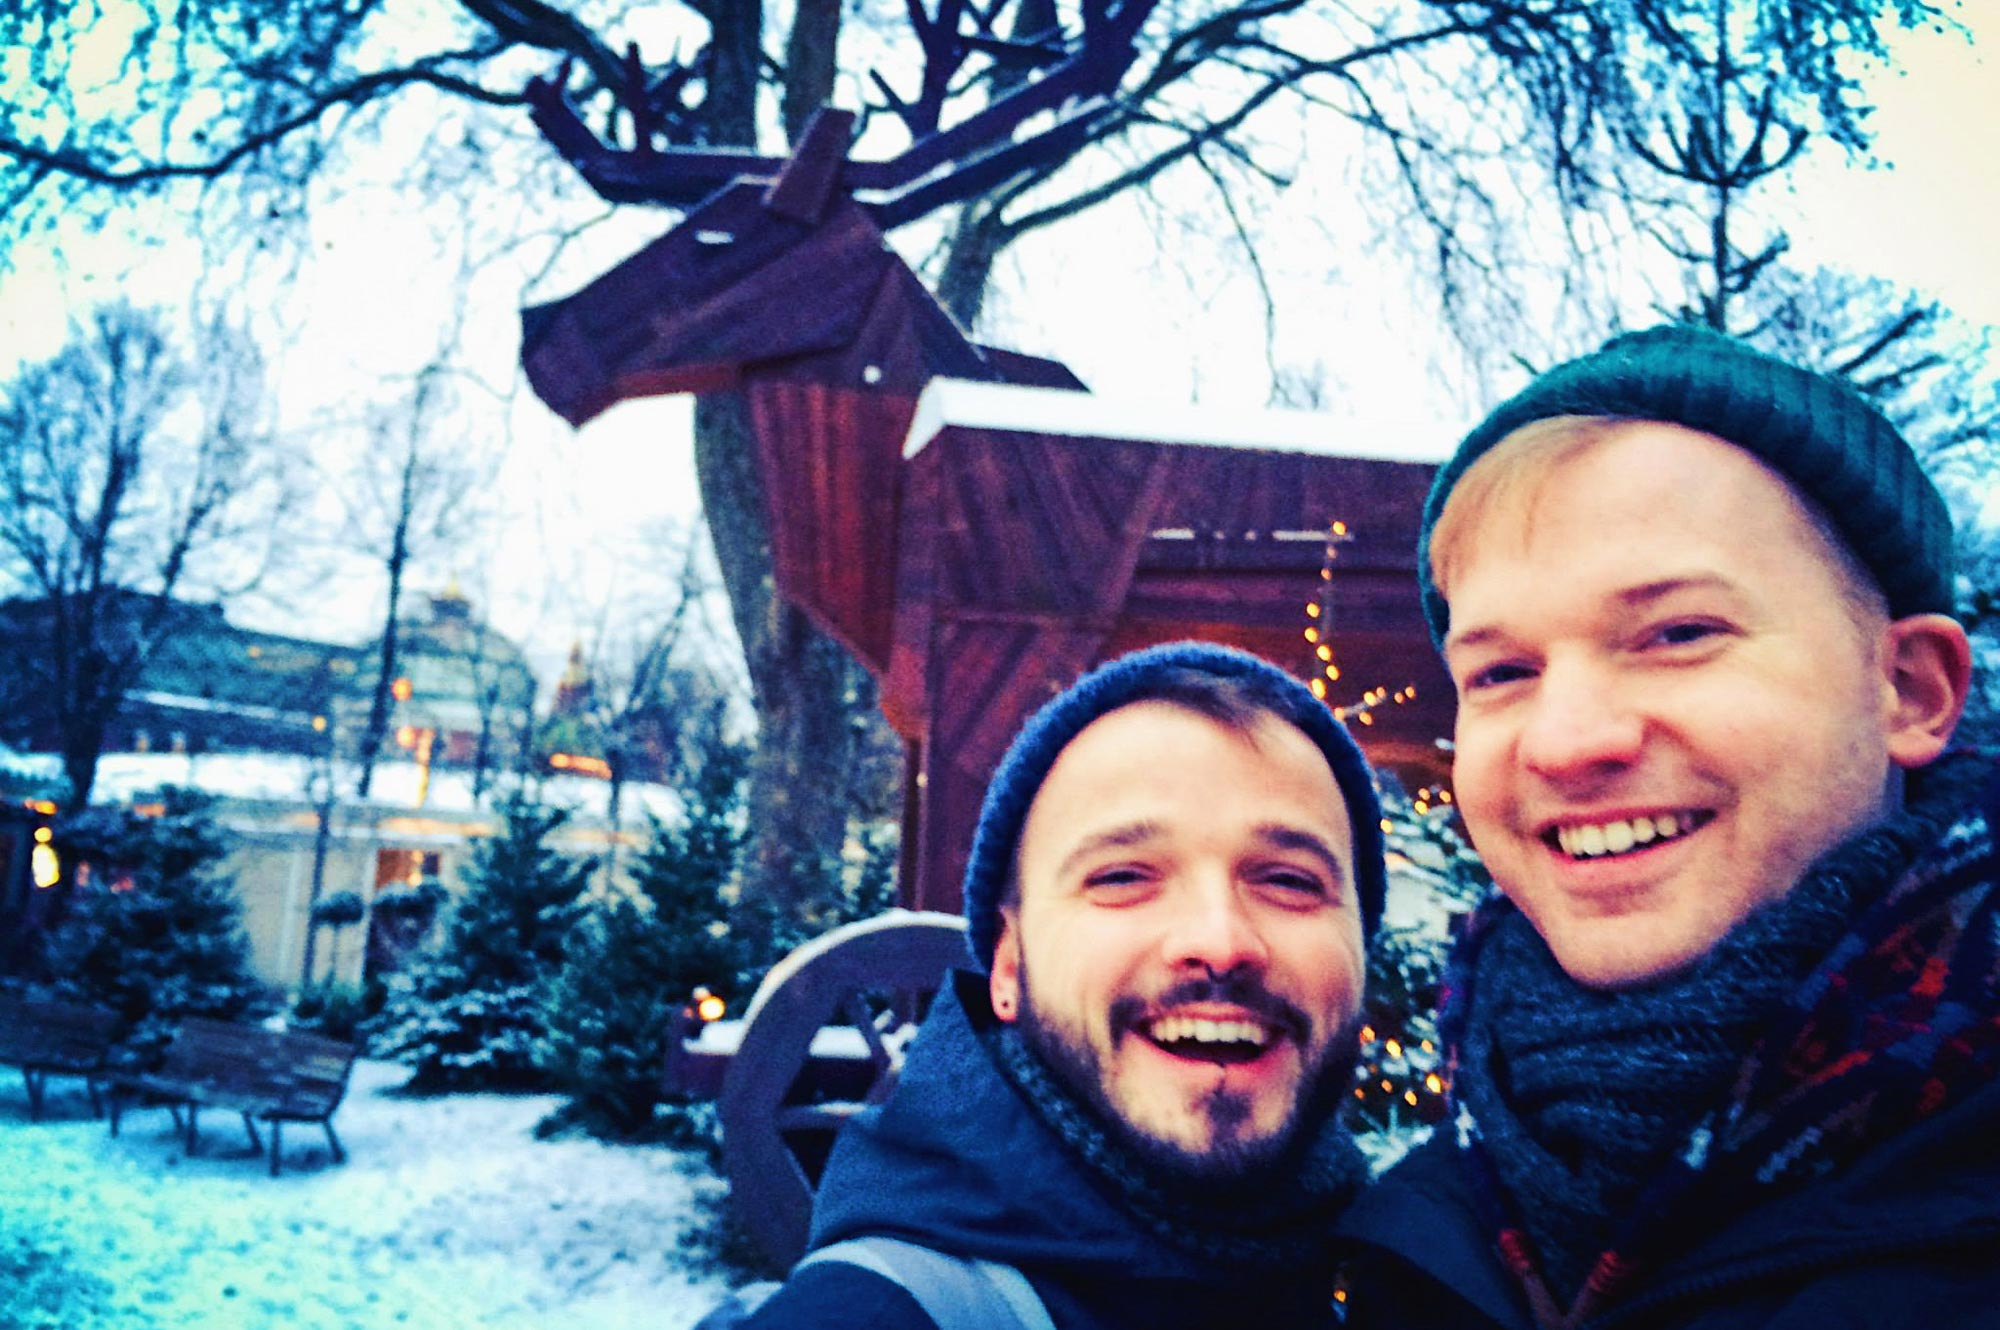 Gay Travel Guide Tivoli Gardens Copenhagen Winter © CoupleofMen.com